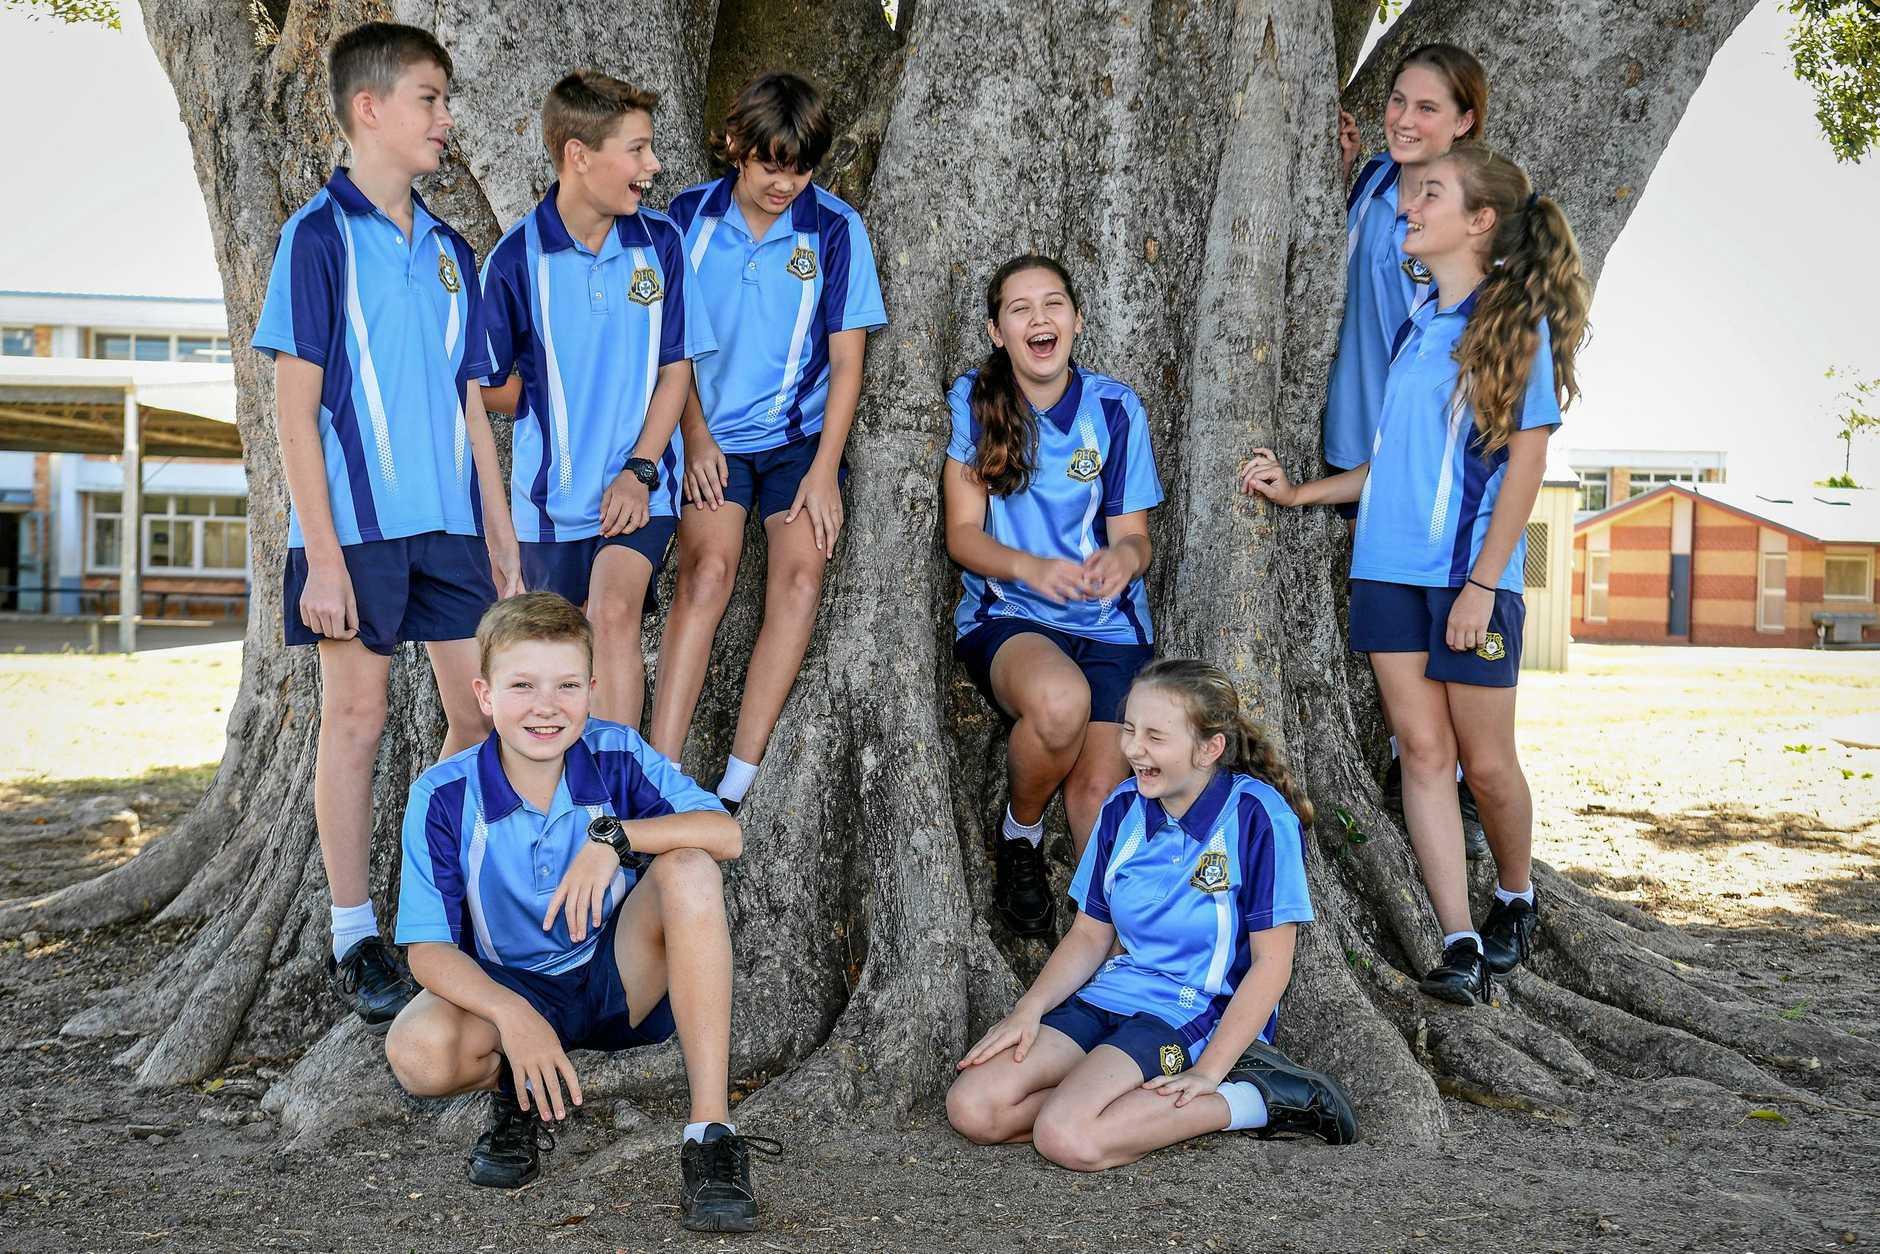 Bundaberg High School students, Chris Collins, Sam Stuchbery, Josh Anderson, Scarlett Wallace, Lucy Steindl, Cadence Taylor, Fletcher Churchill and Sarah Warren.